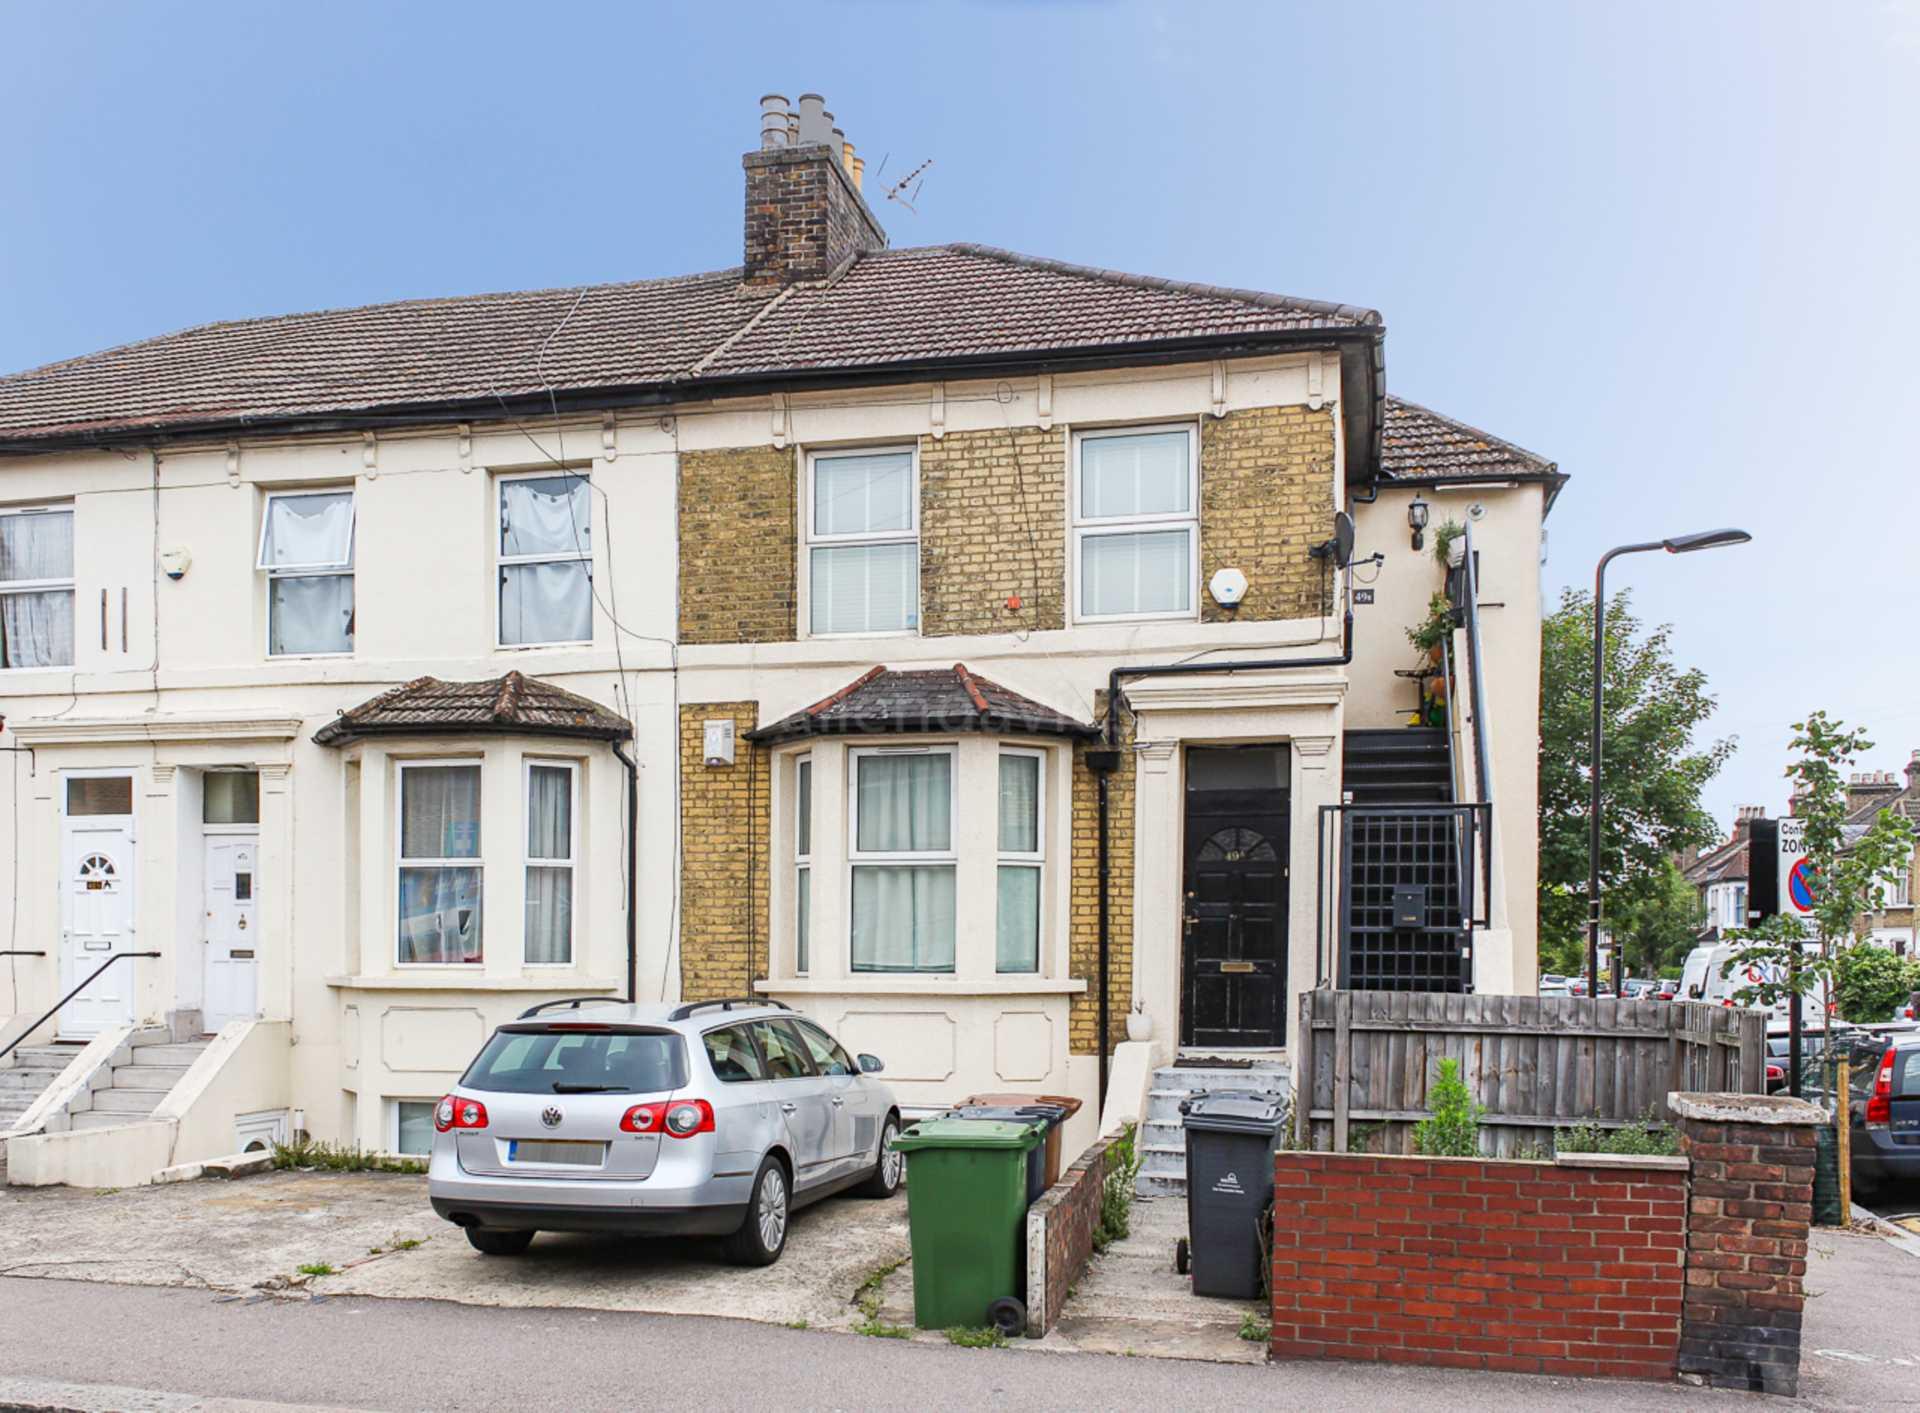 Oliver Road, Leyton, E10, Image 18